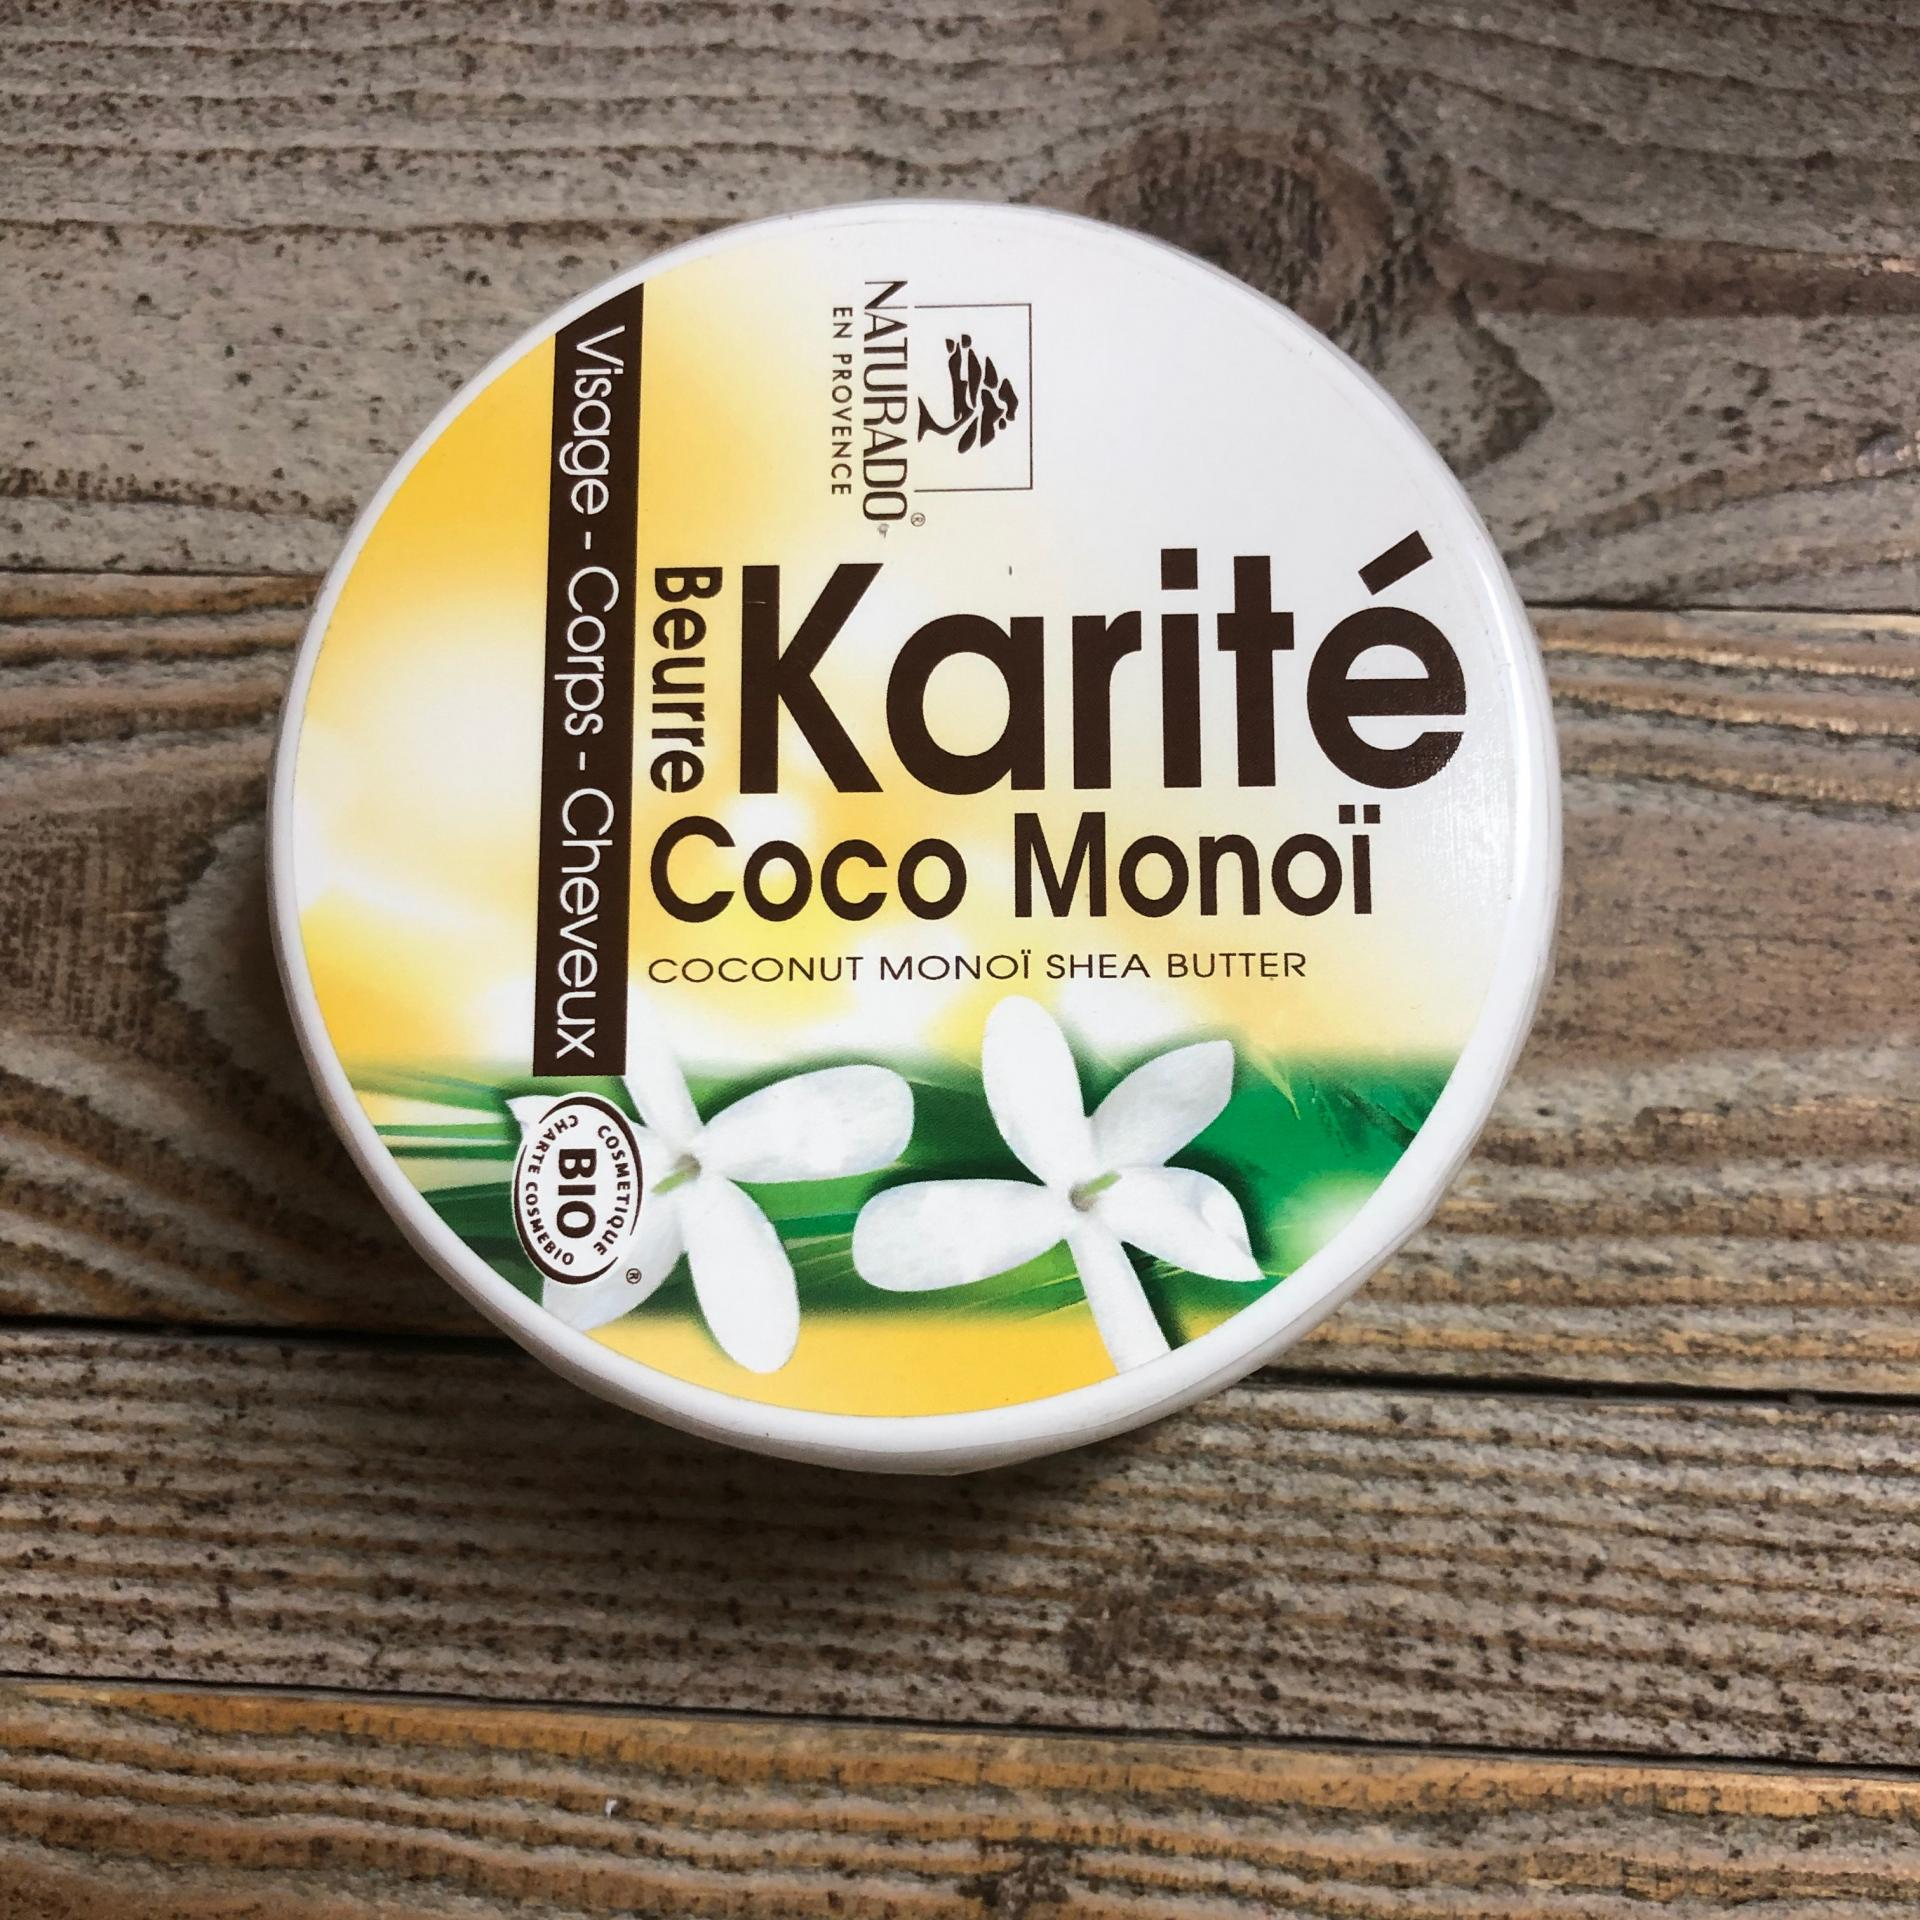 Beurre karite coco monoi